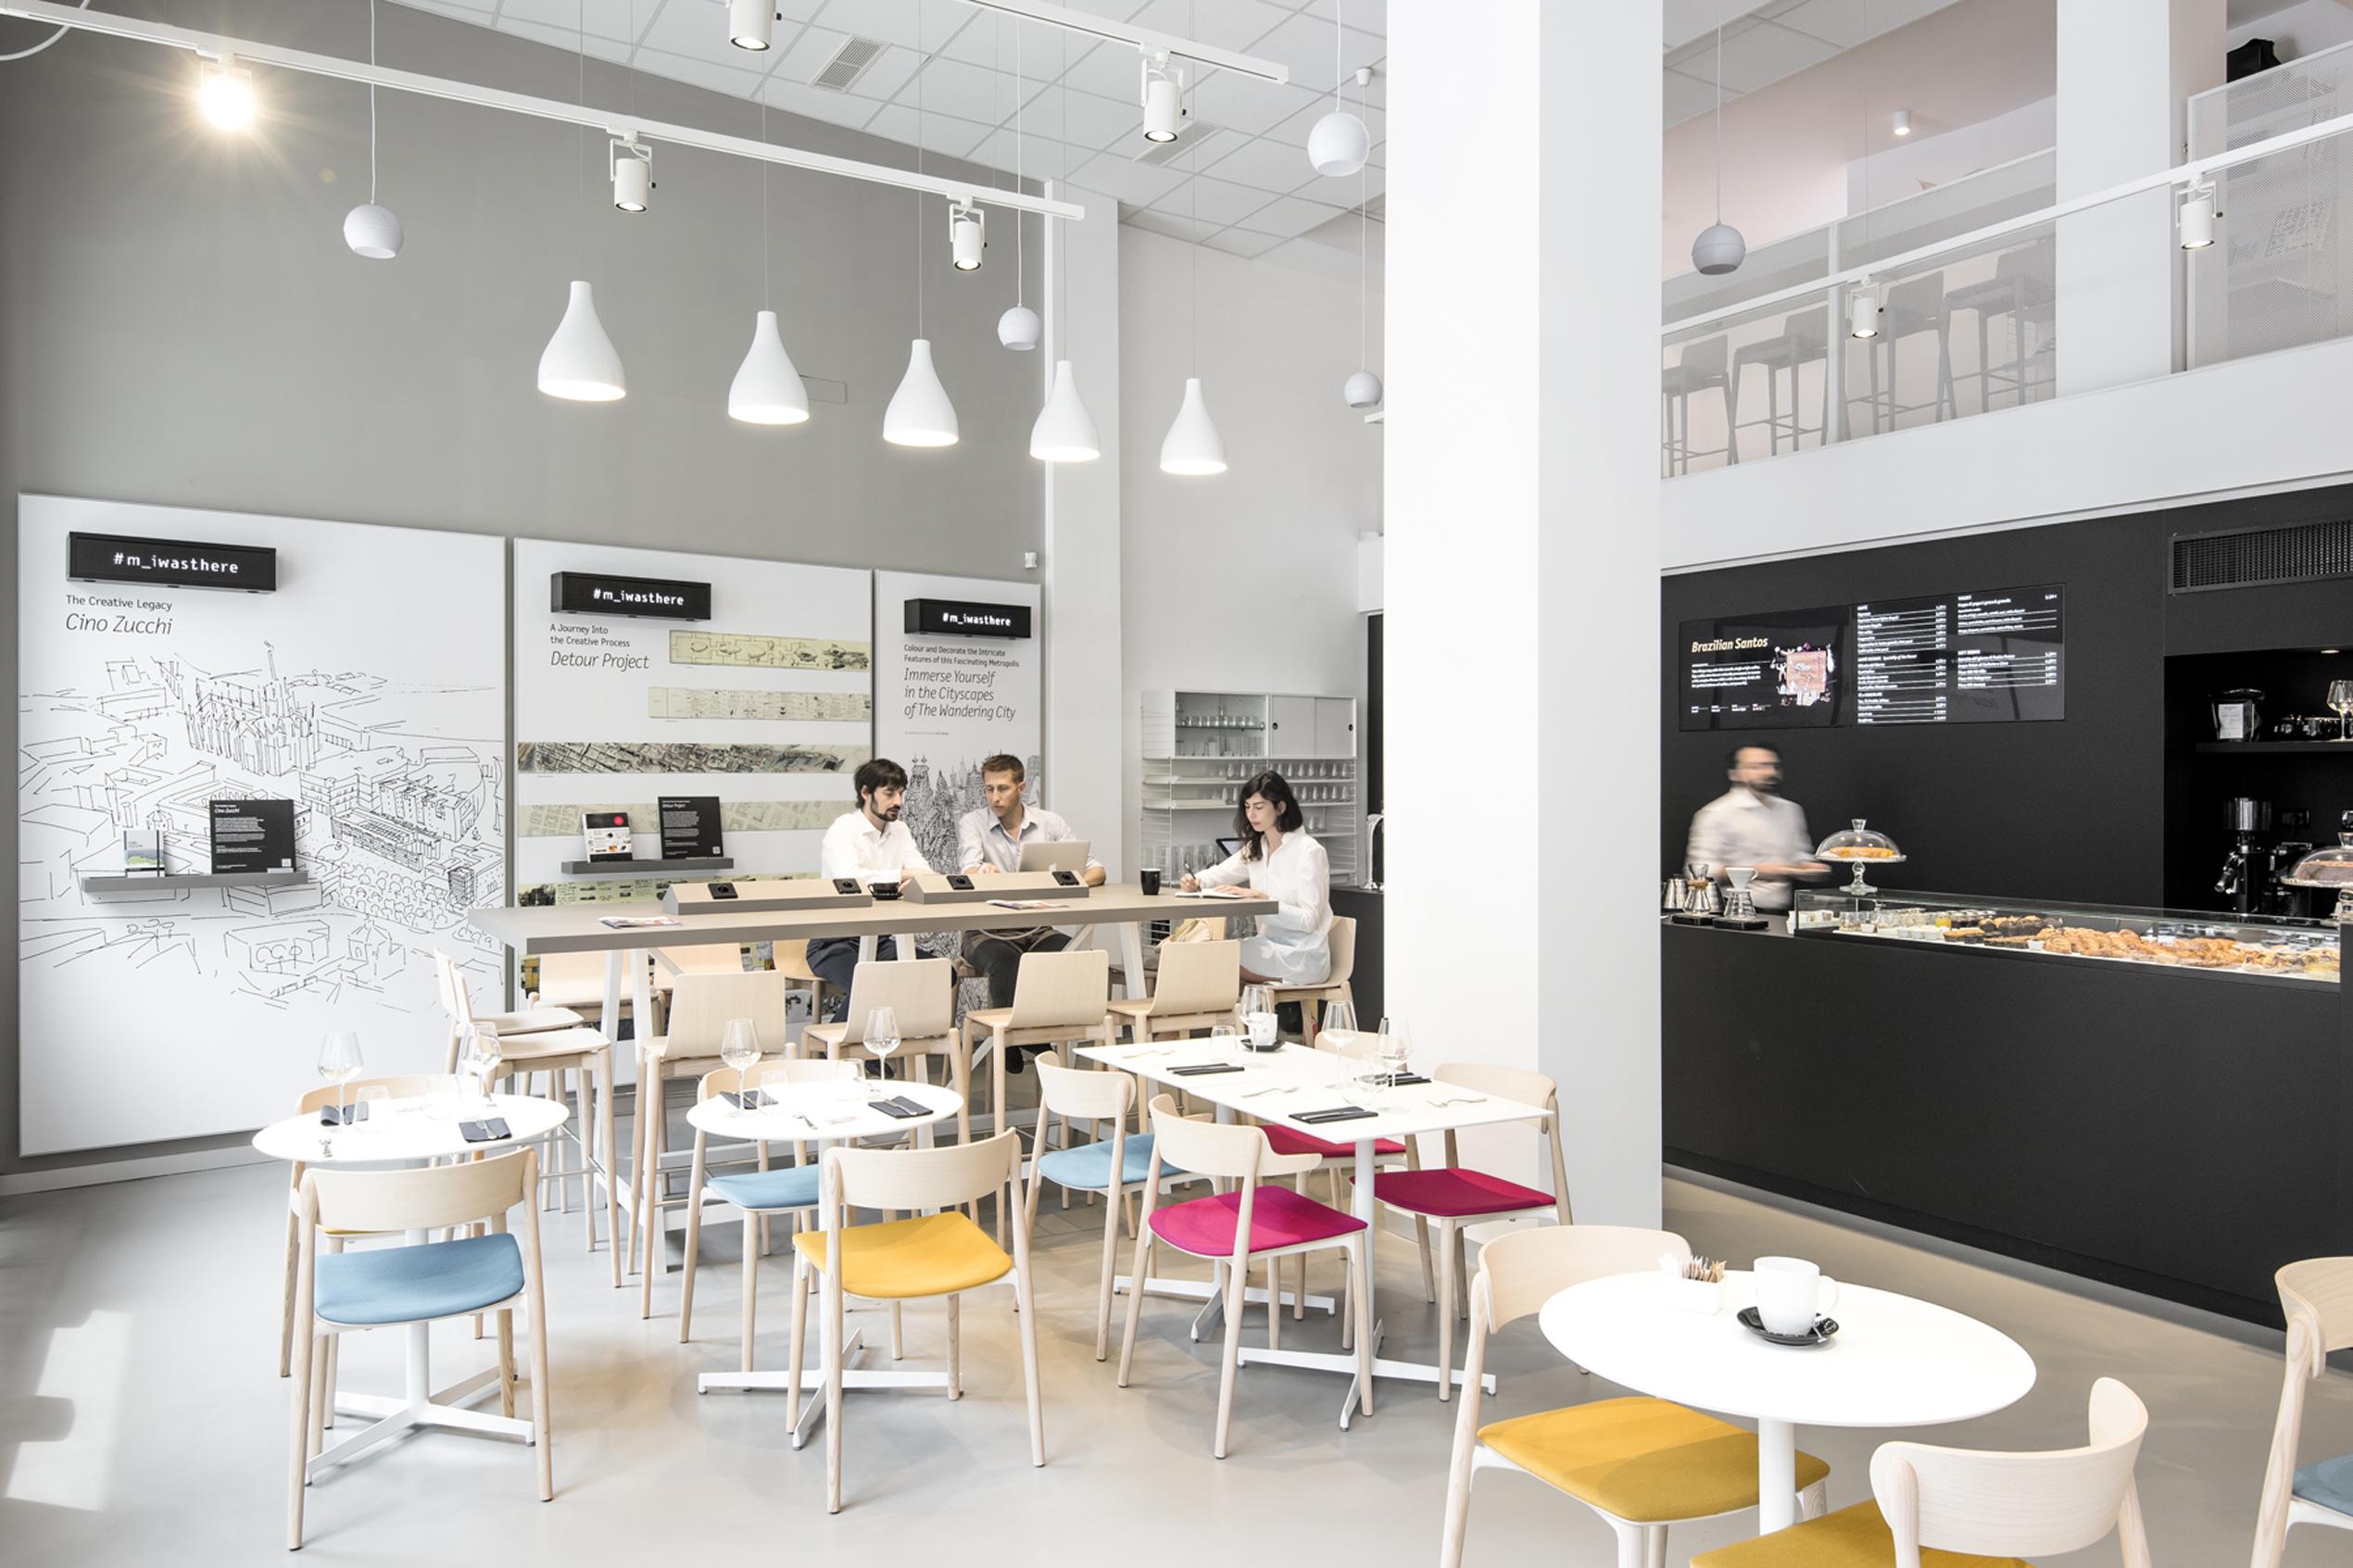 dans-ta-pub-moleskine-cafe-milan-inspiration-coffee-1